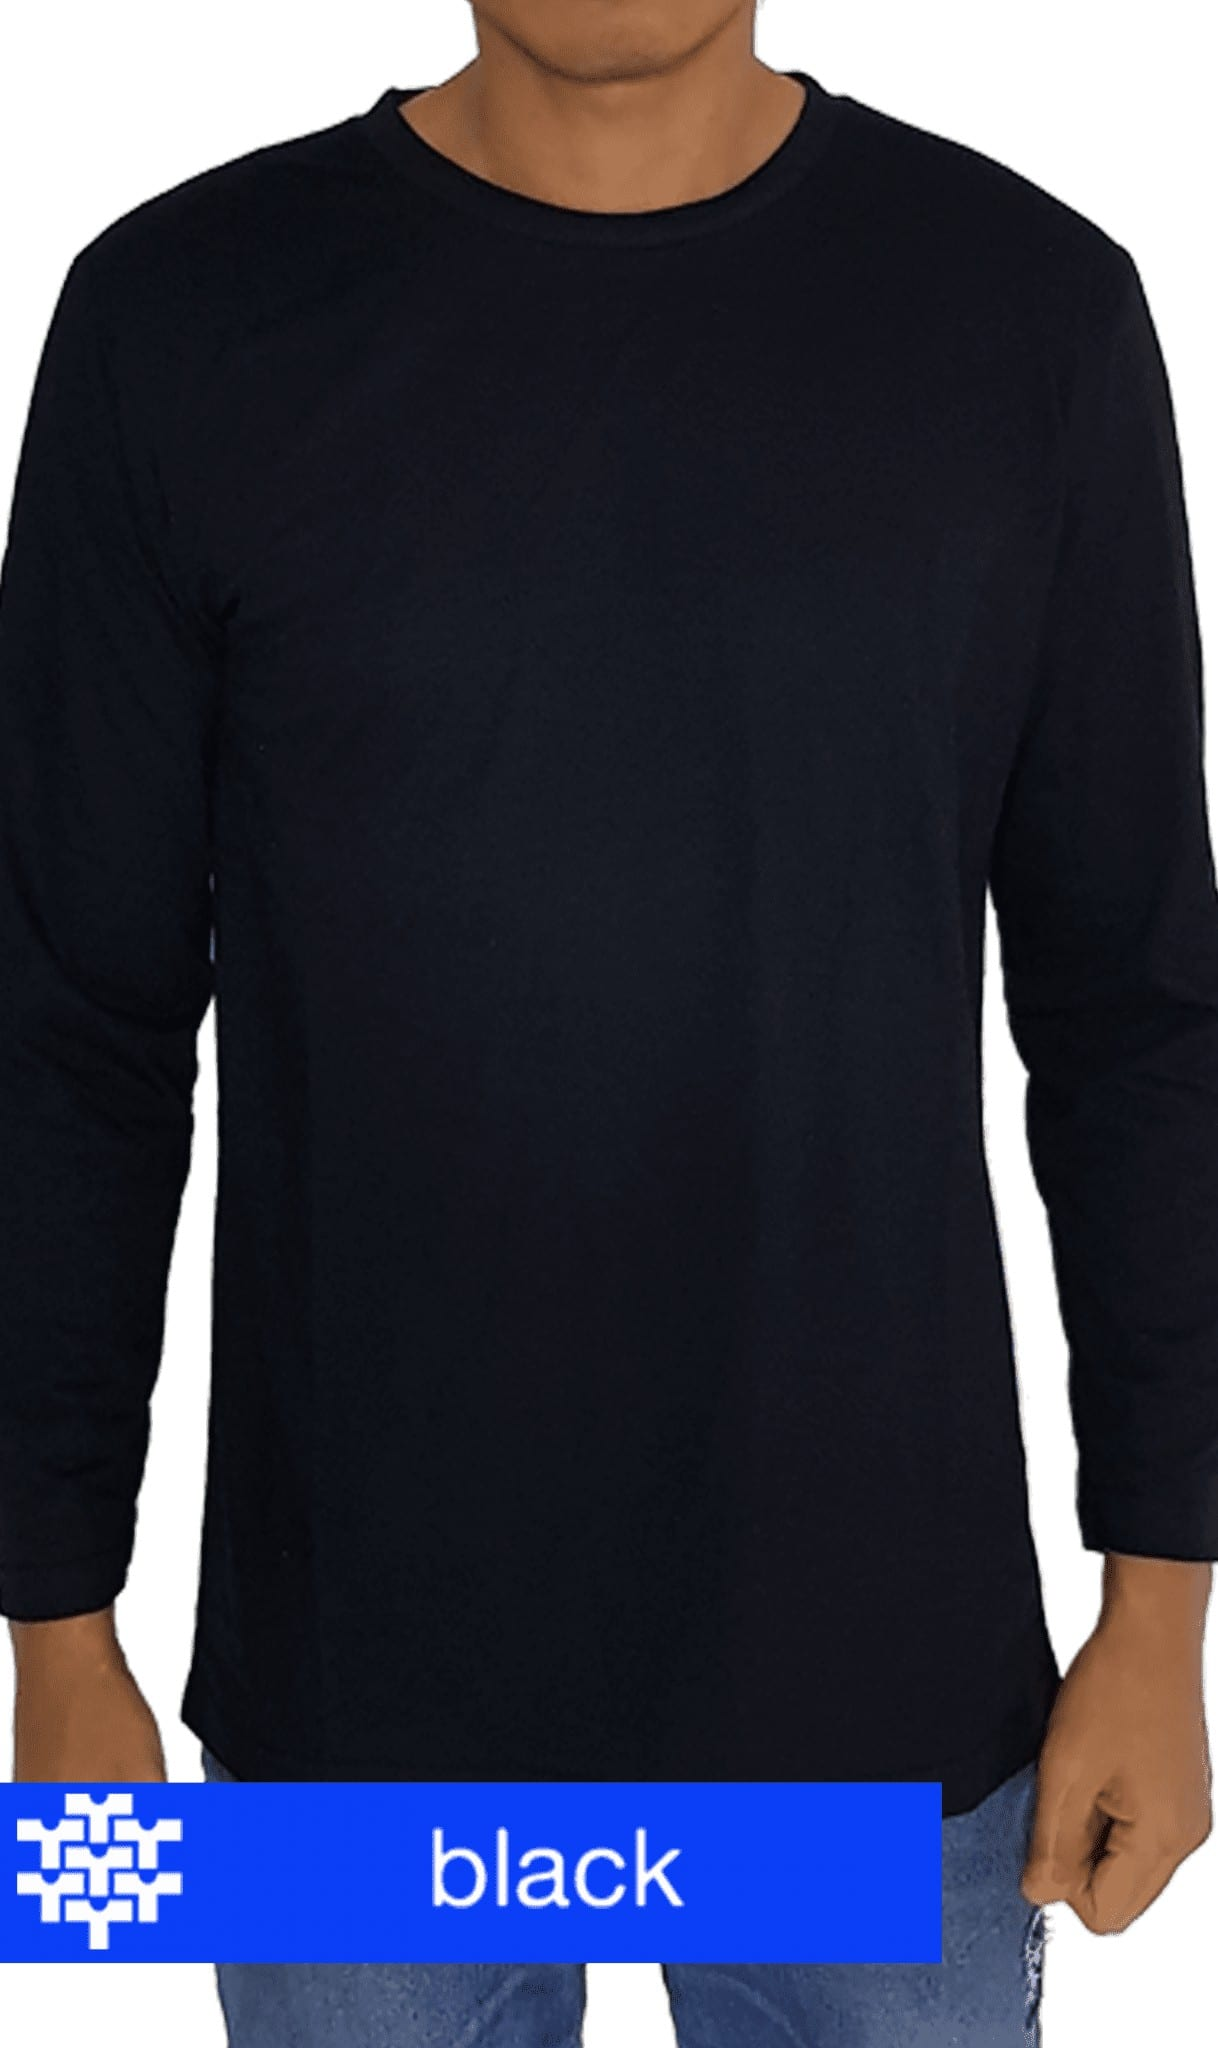 Contoh Baju Lengan Panjang Hitam - Juwitala